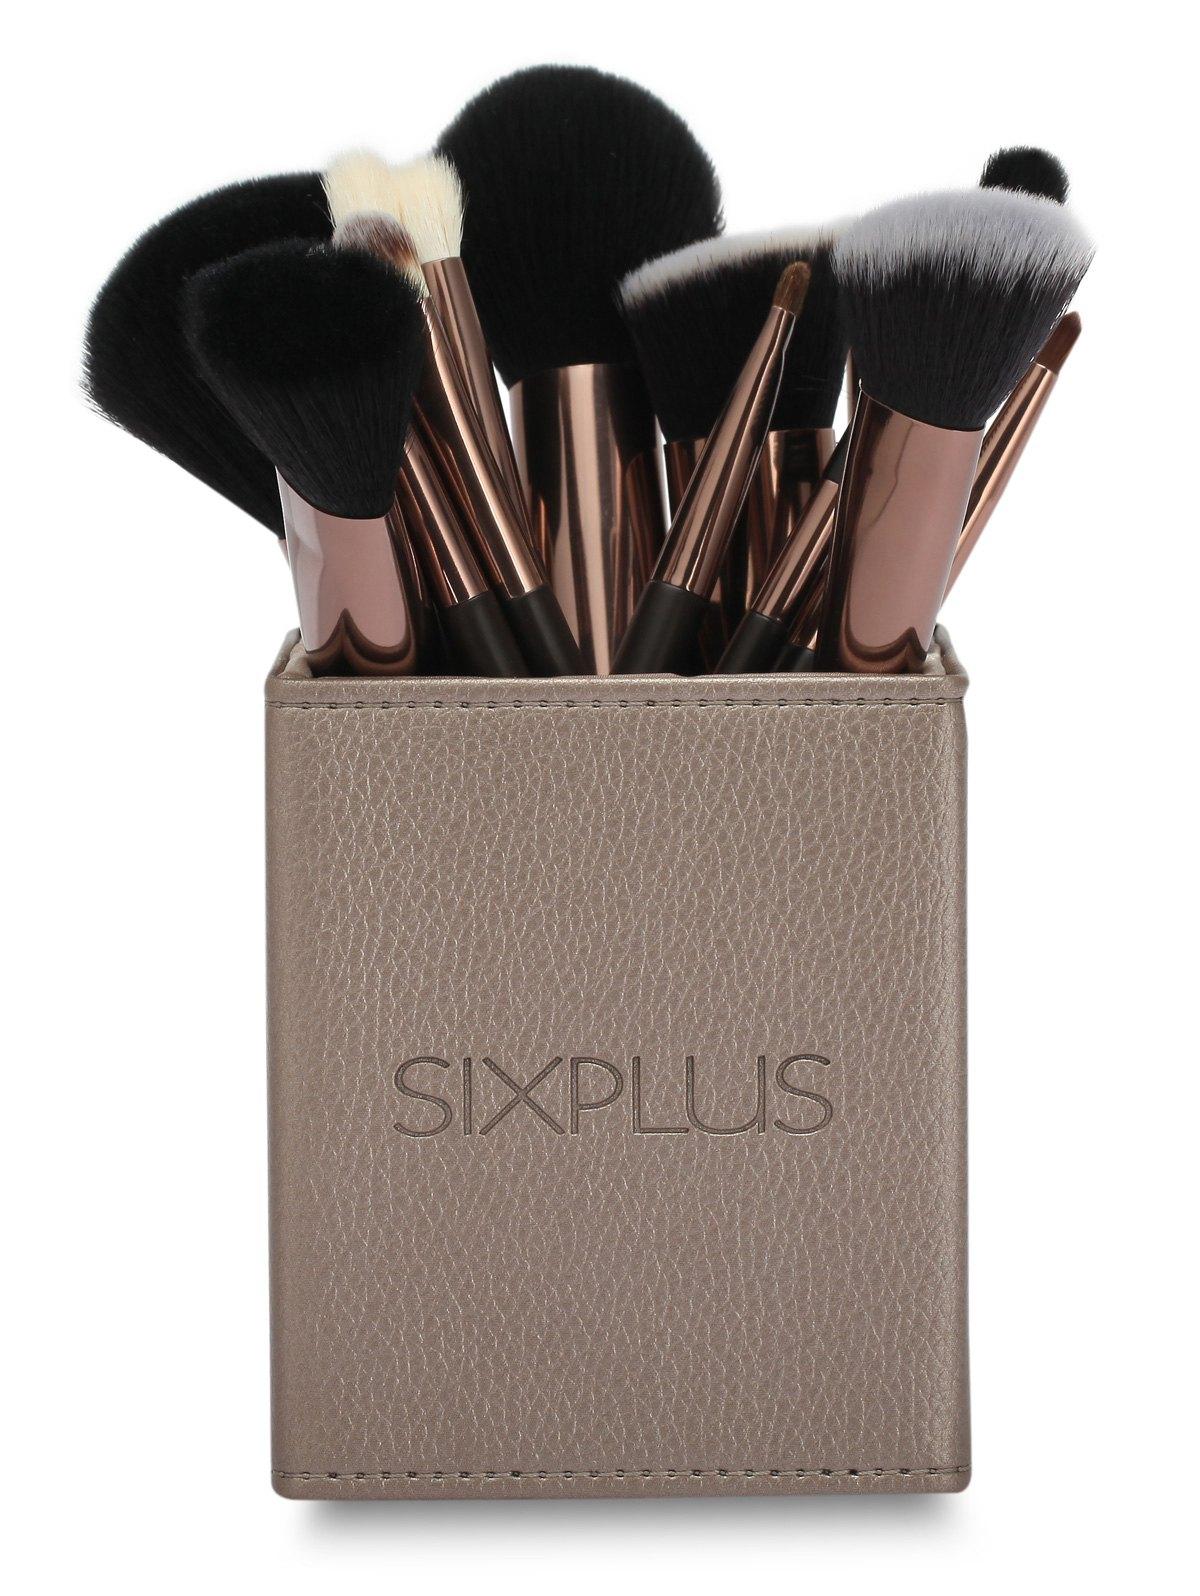 15 Pcs Animal Hair Makeup Brushes Set With Square Brush Holder